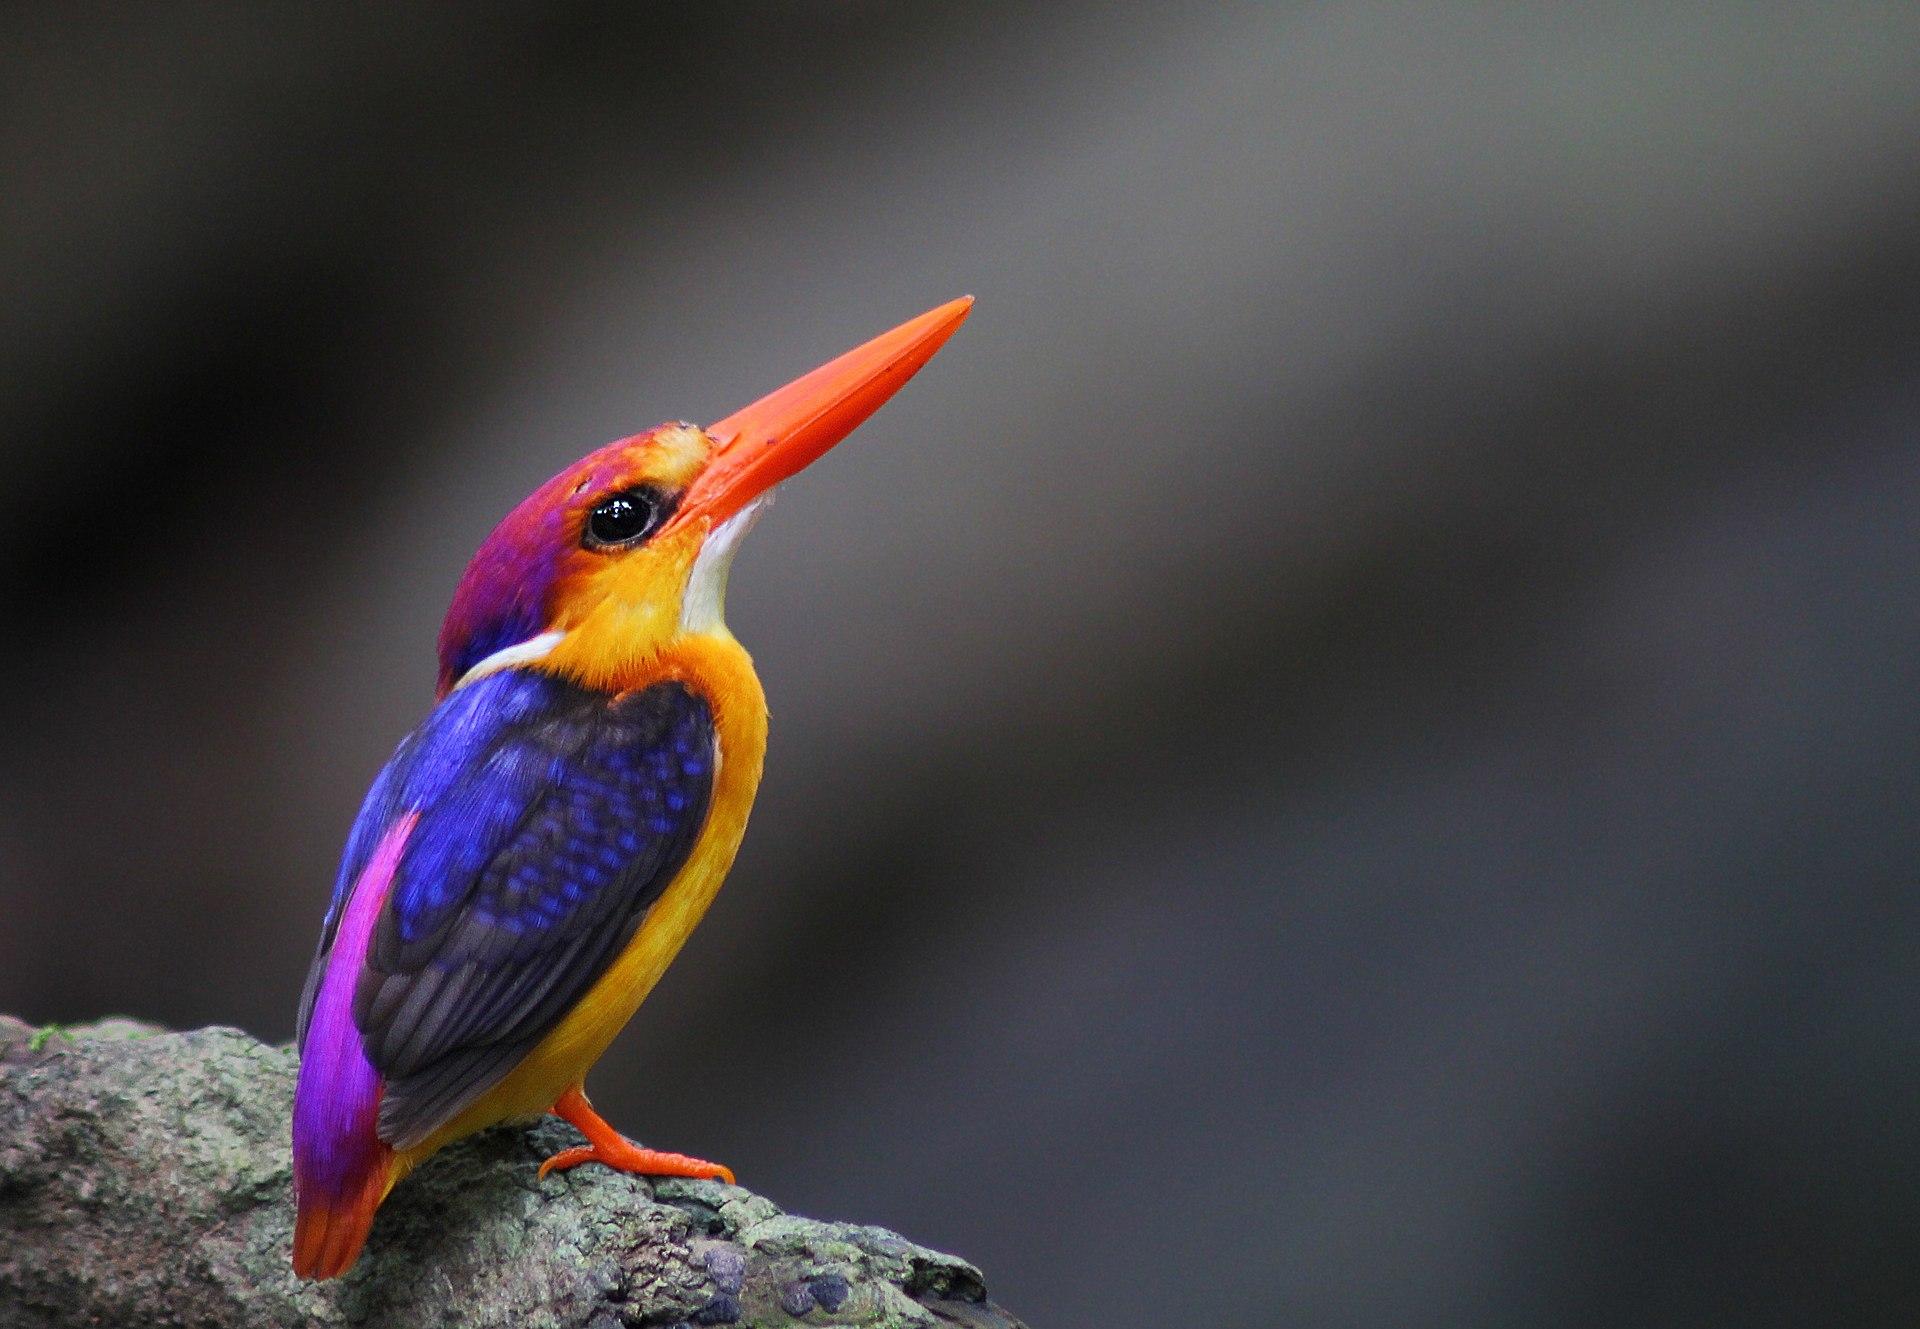 Asian kingfisher